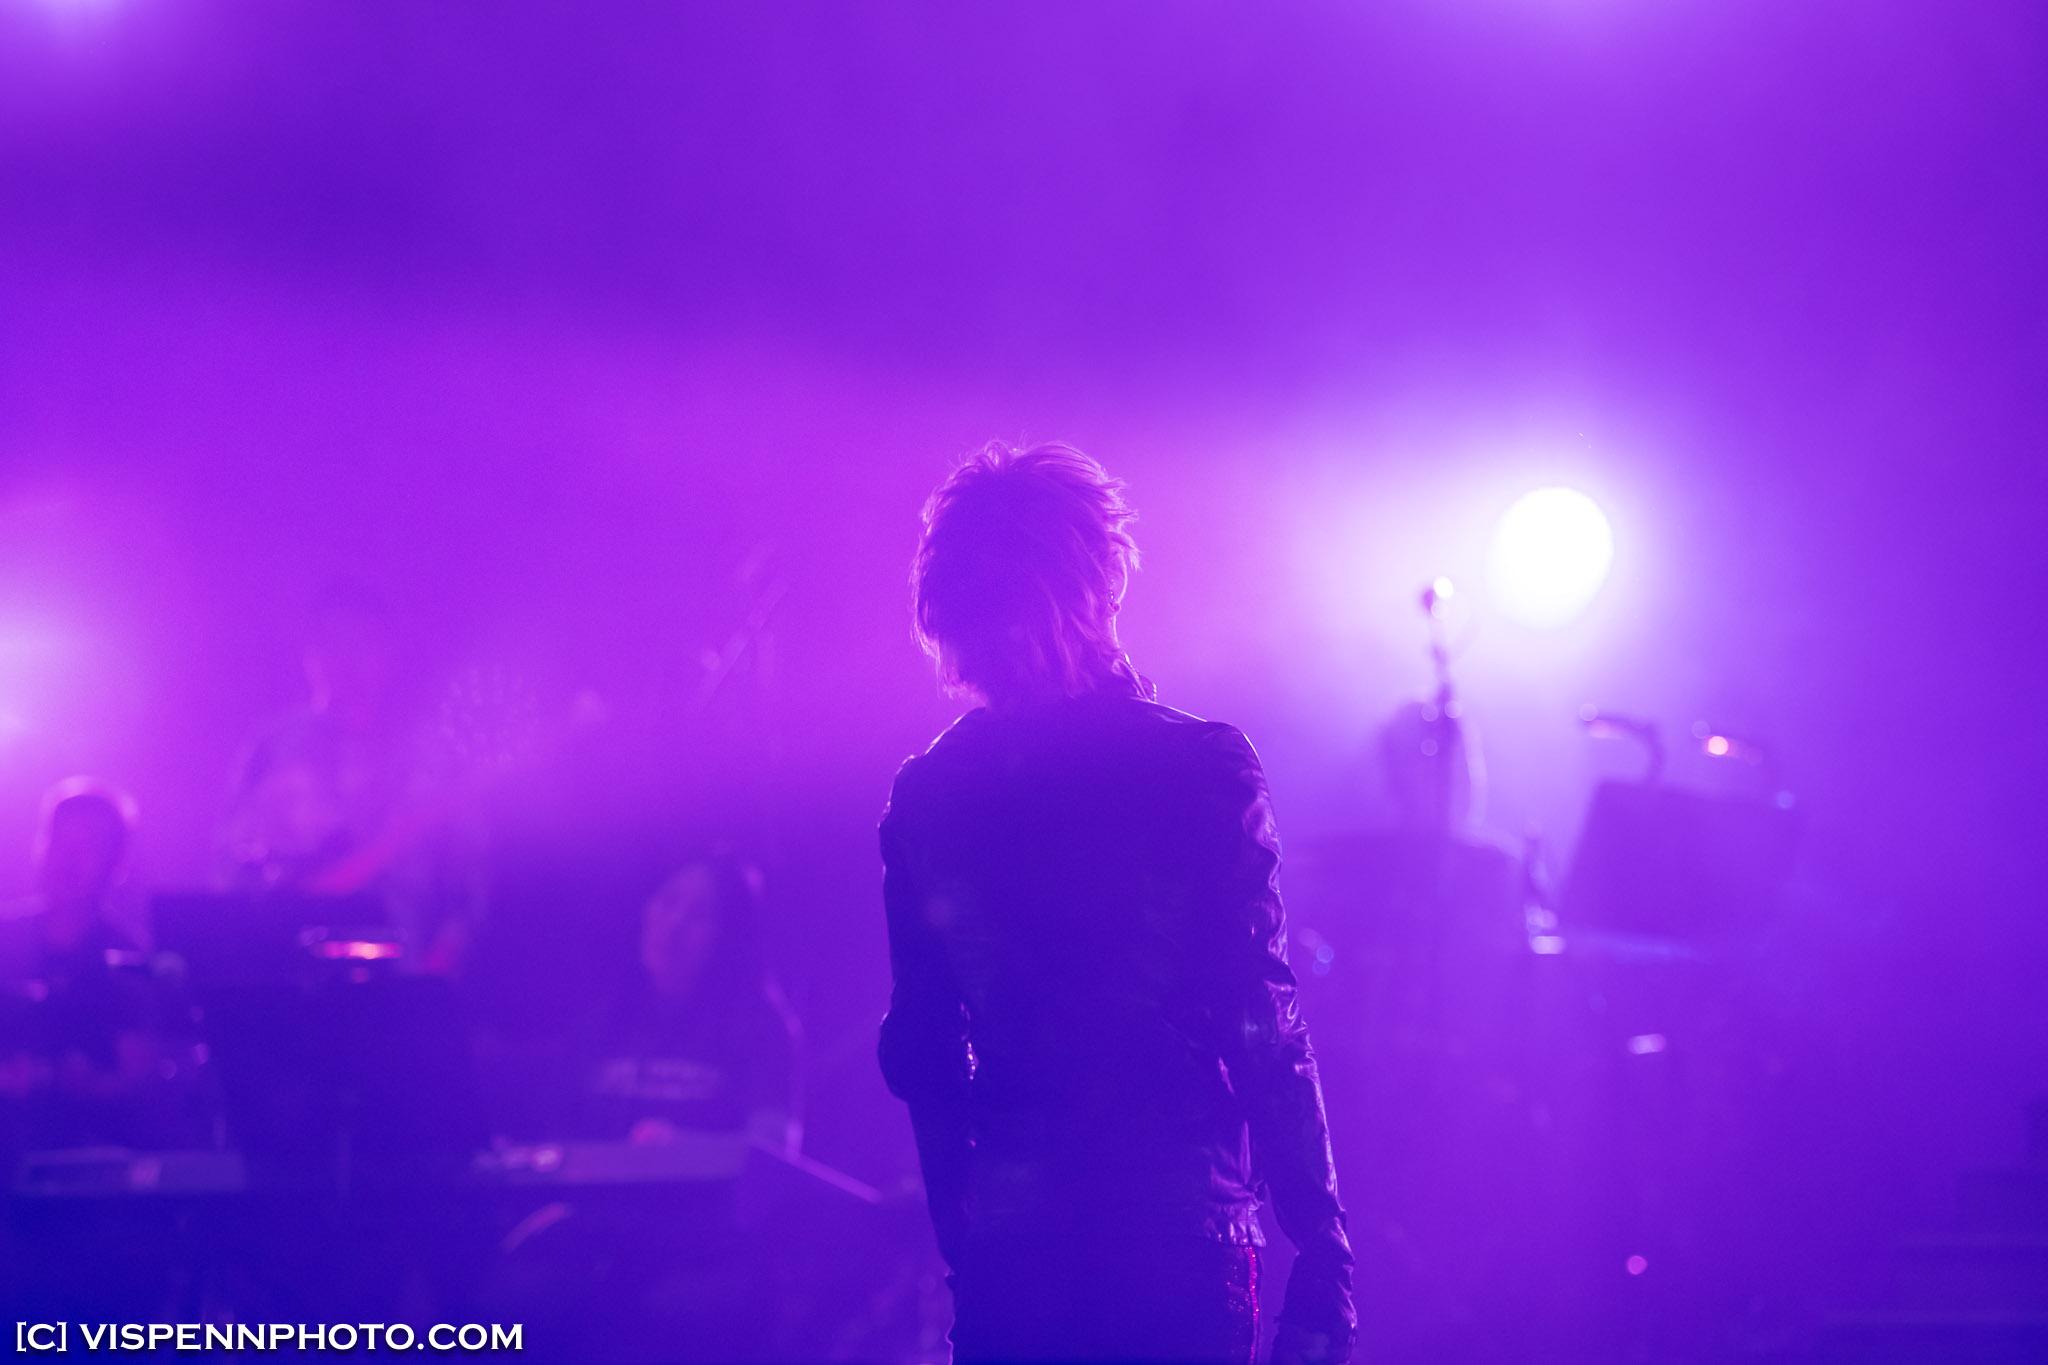 Melbourne CONCERTS Photography 墨尔本 演唱会 照片 摄影师 VISPENN JokerXUE 3H 5513 5D4 VISPENN